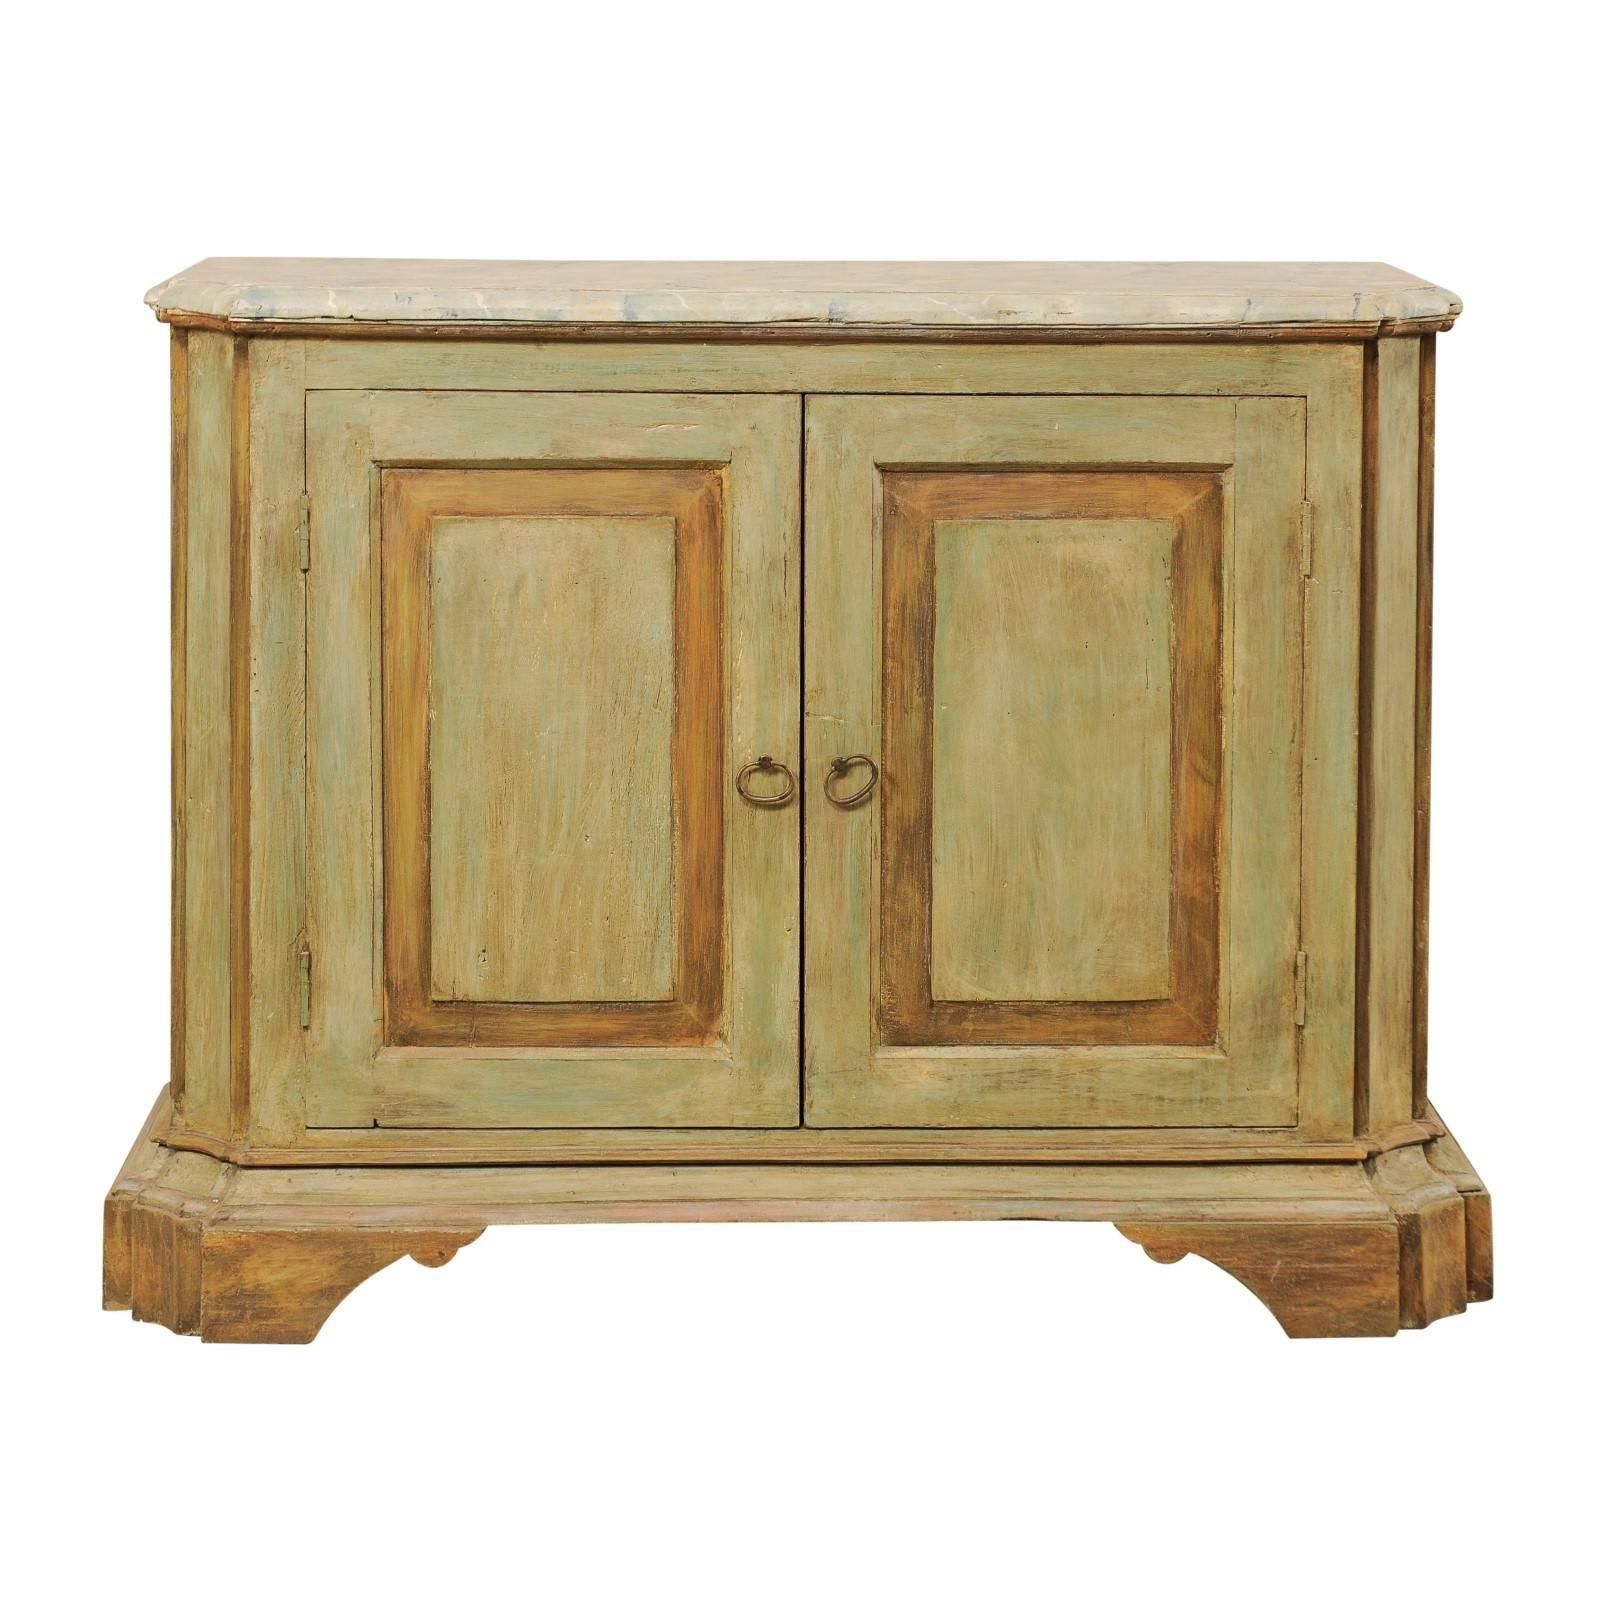 Vintage Italian Style Two-Door Painted Wood Buffet Console on Bracket Feet